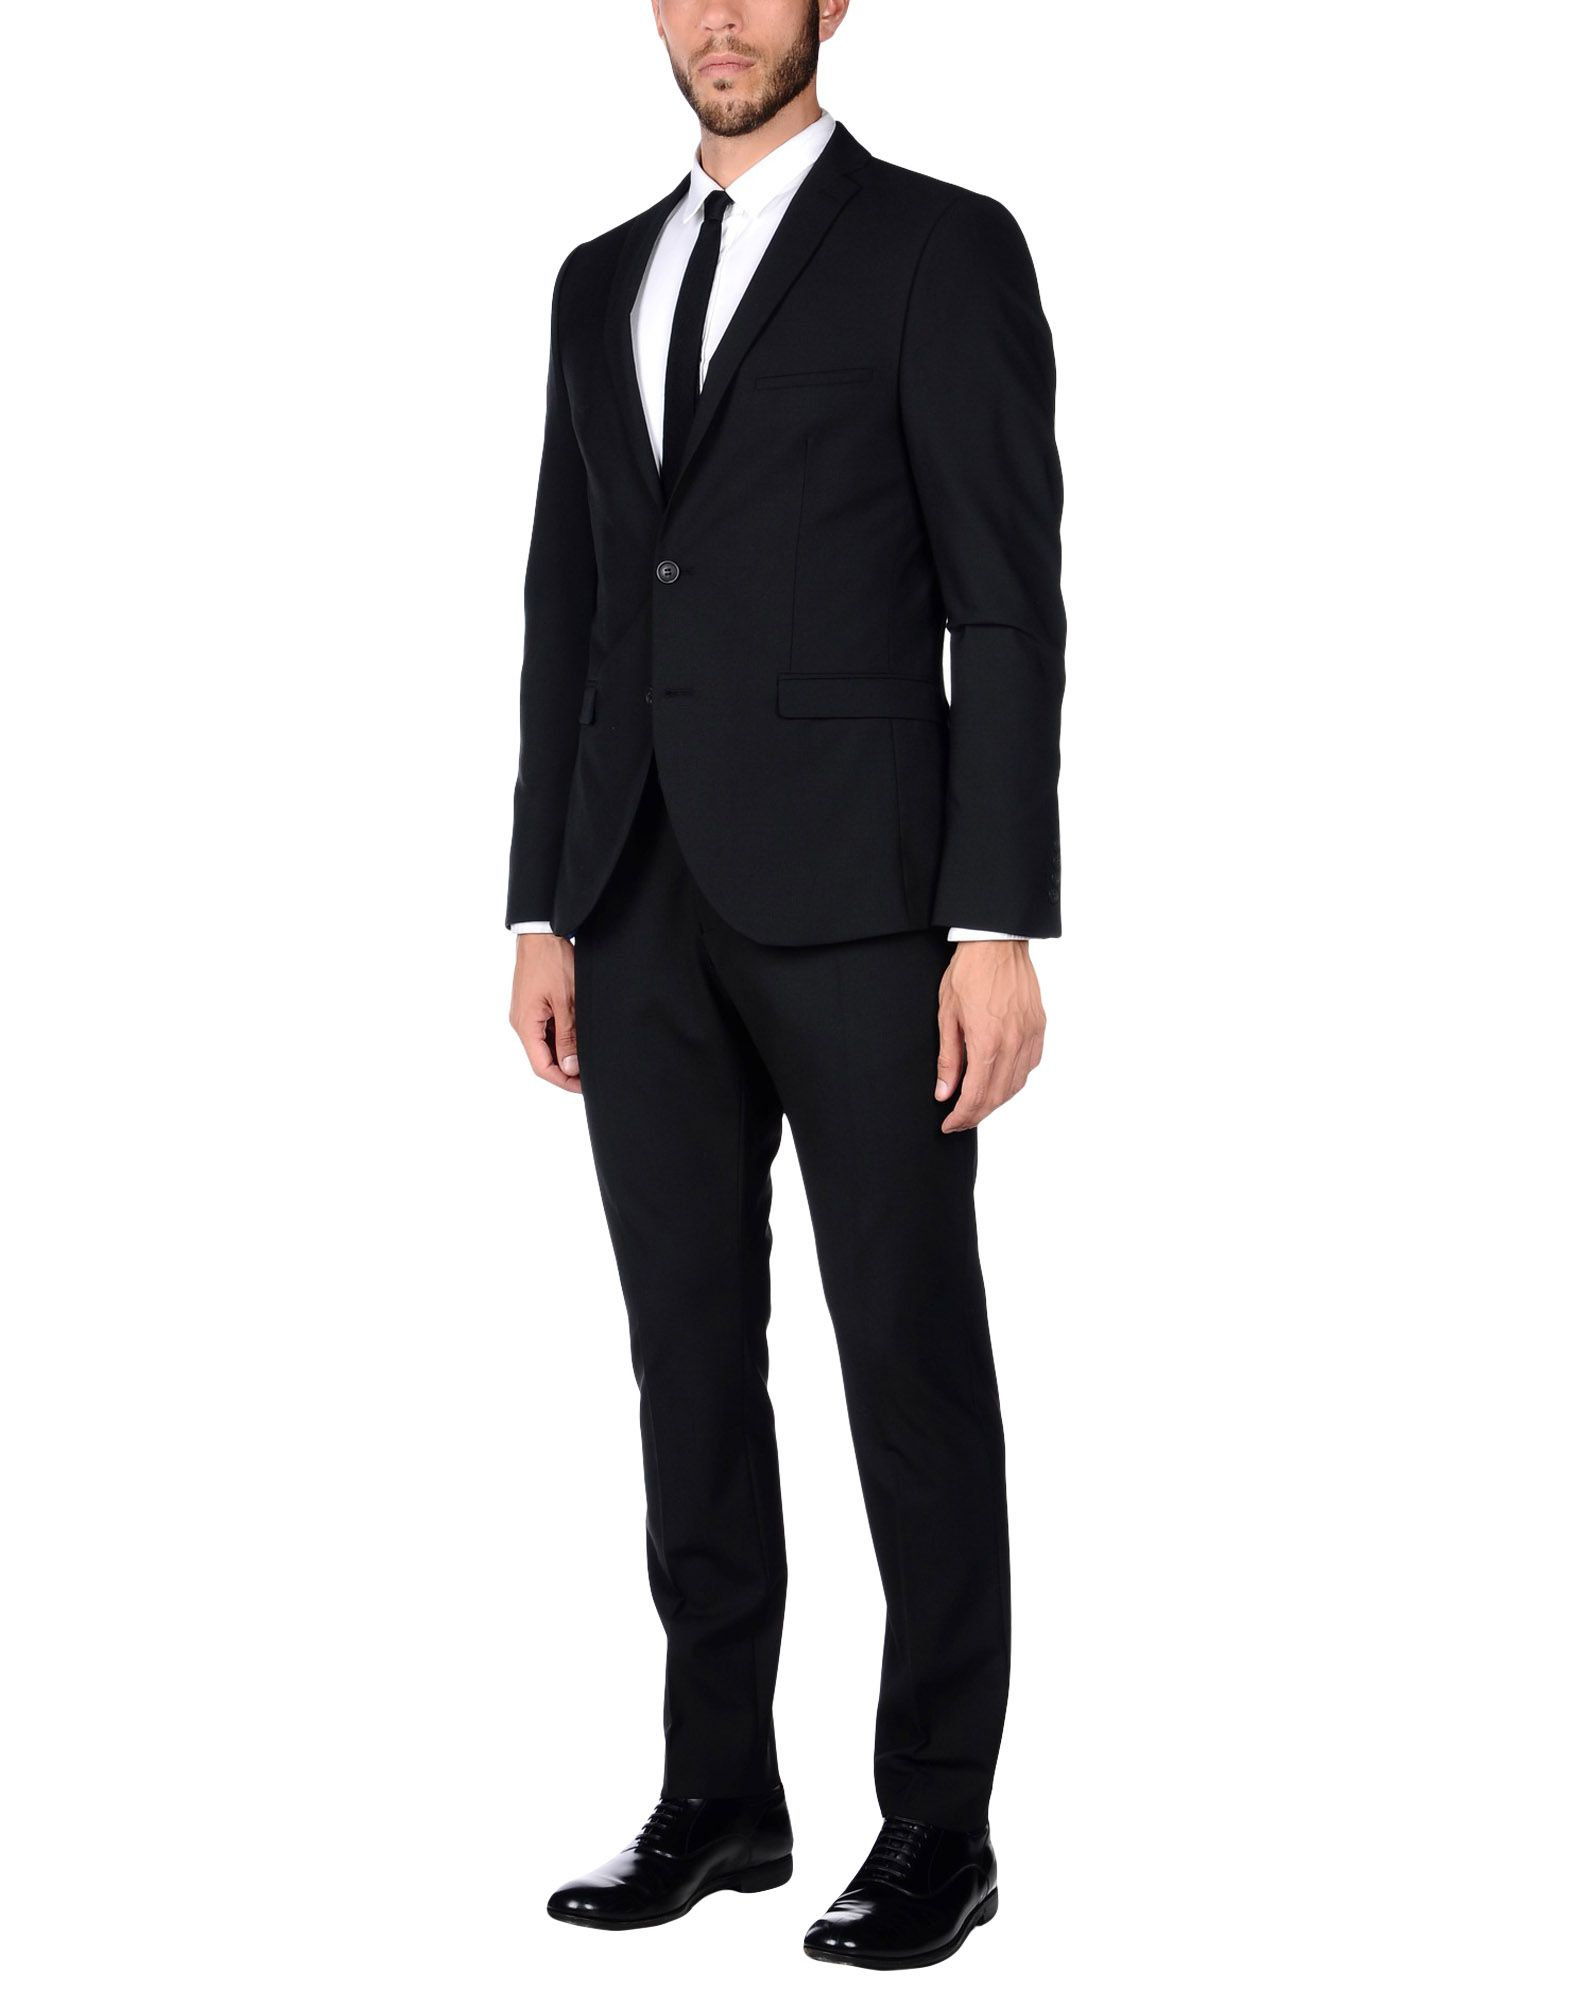 ANTONIO BANDERAS DESIGN by SELECTED HOMME Костюм пальто мужское selected homme antonio banderas цвет черный серый 16051623 размер xxl 52